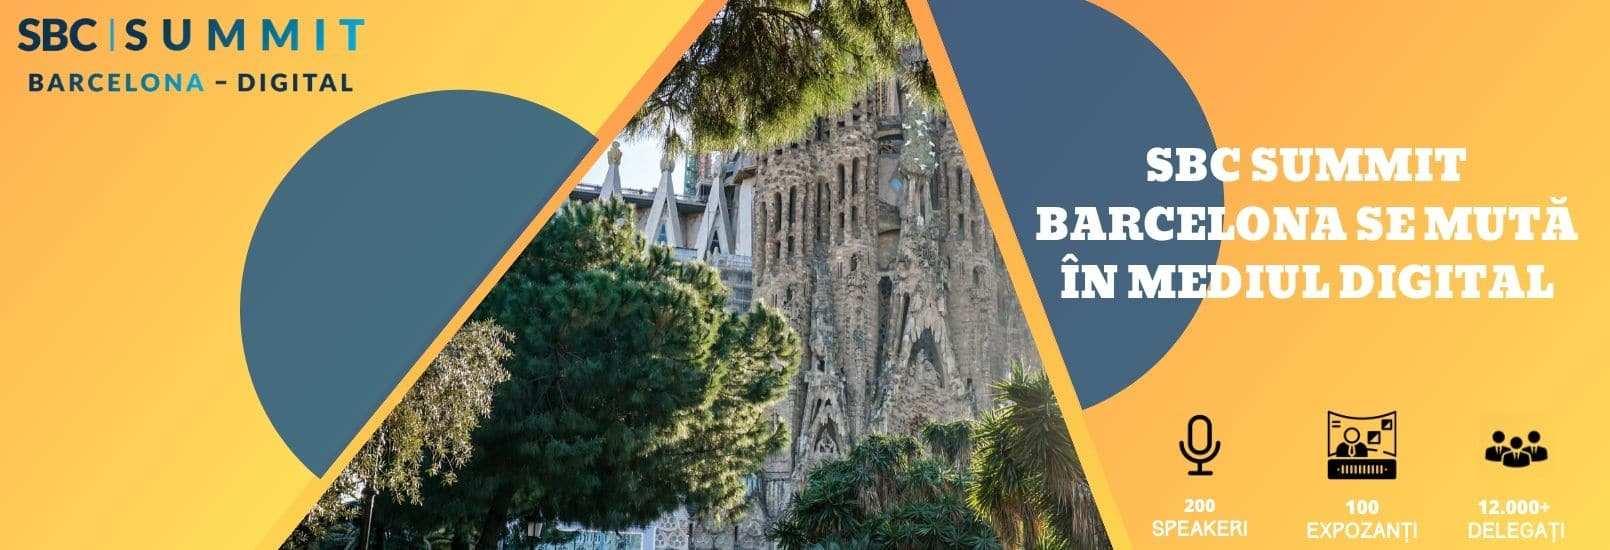 sbc barcelona 2020 summit